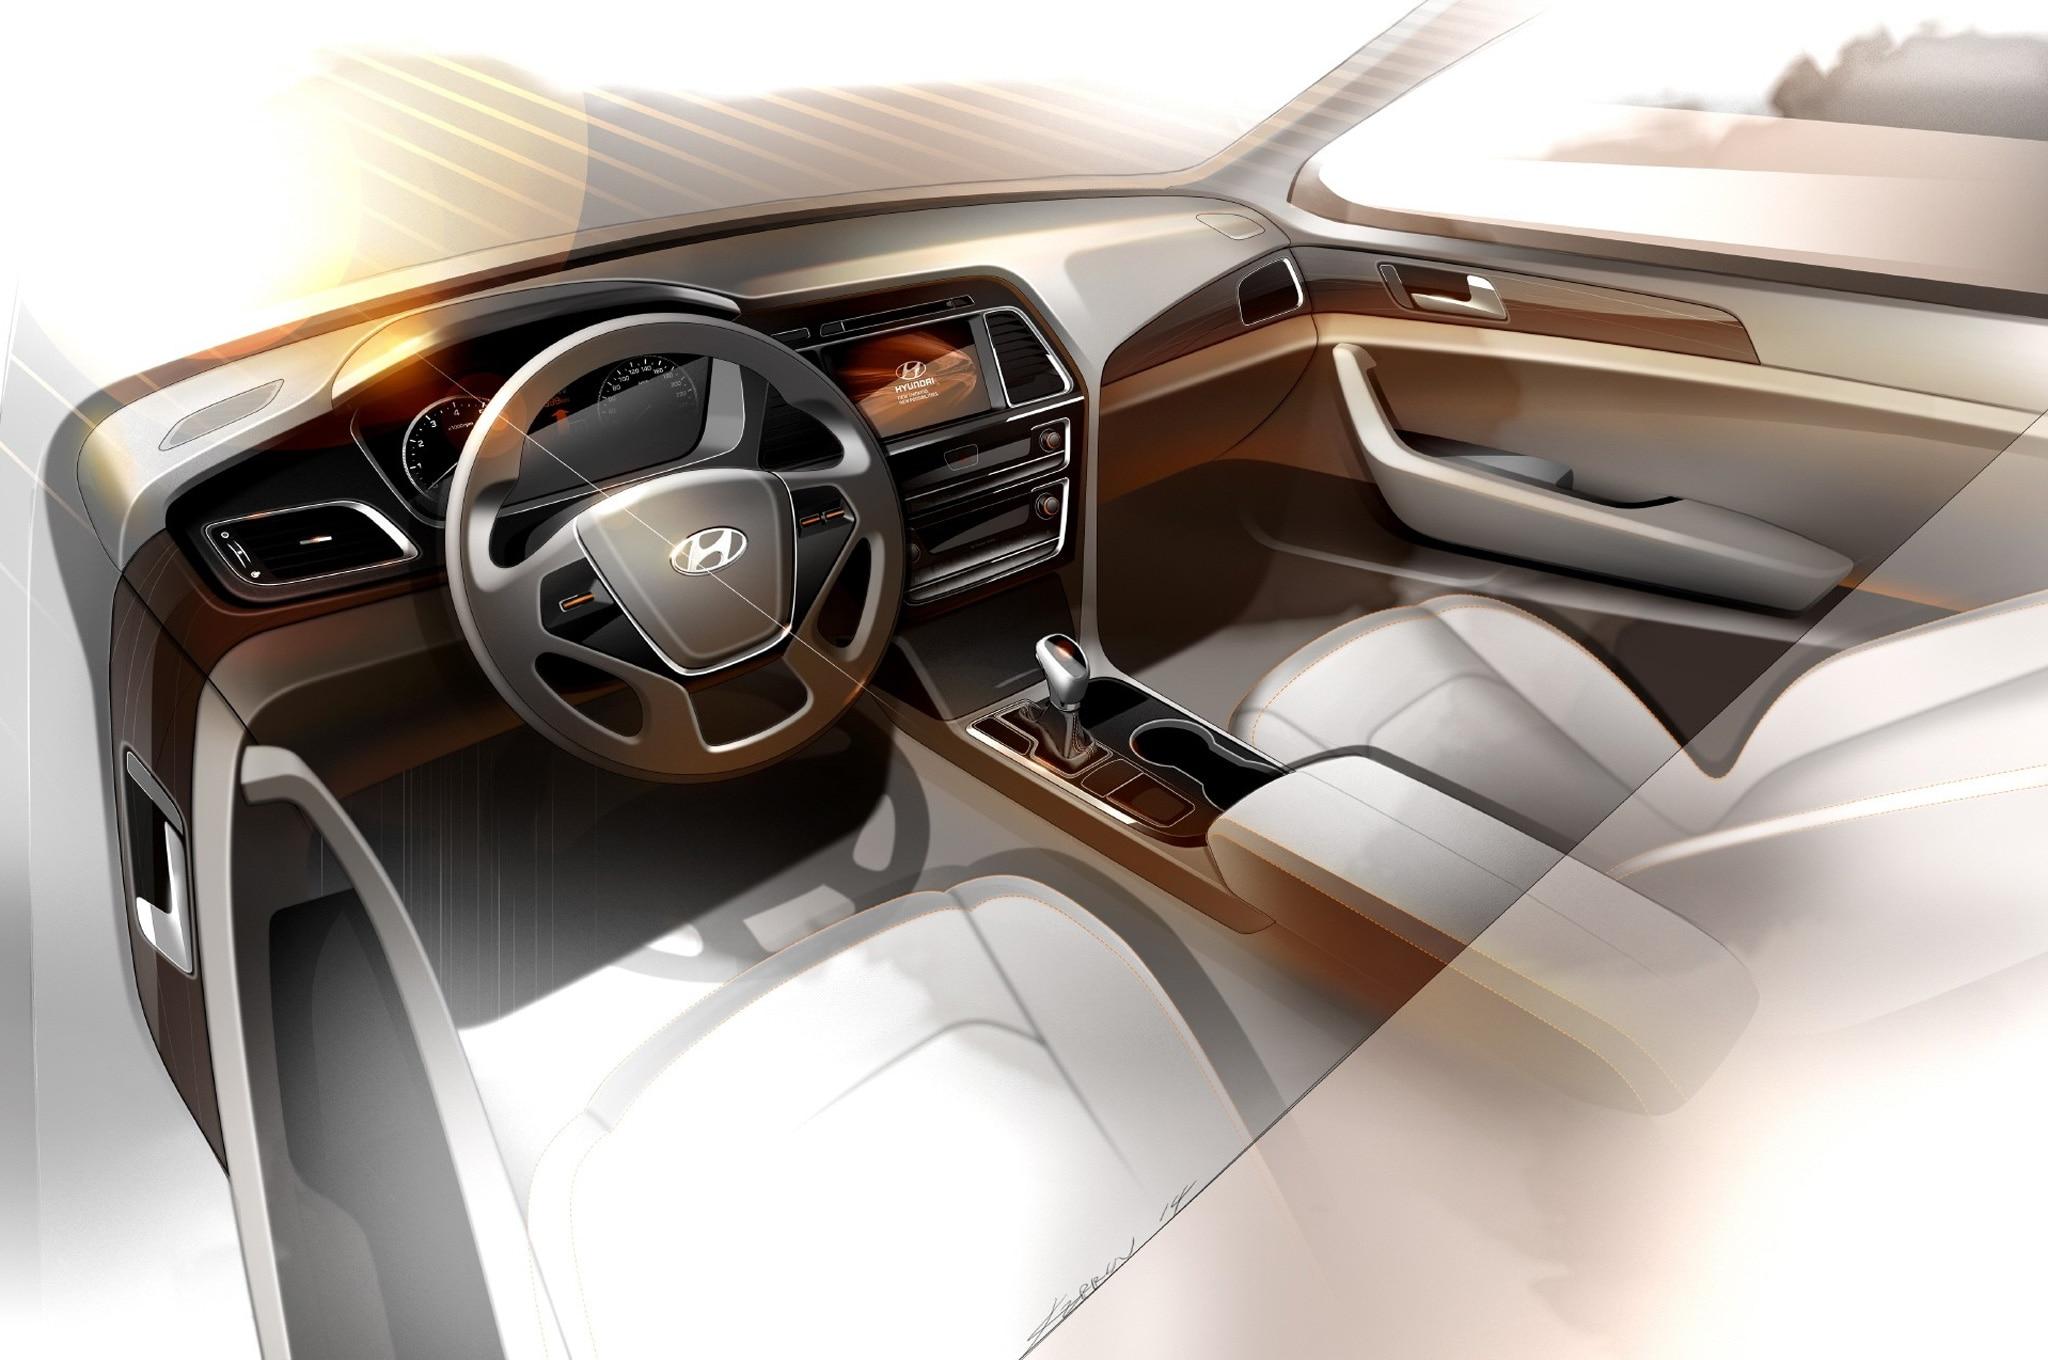 2015 Hyundai Sonata Interior Rendering1